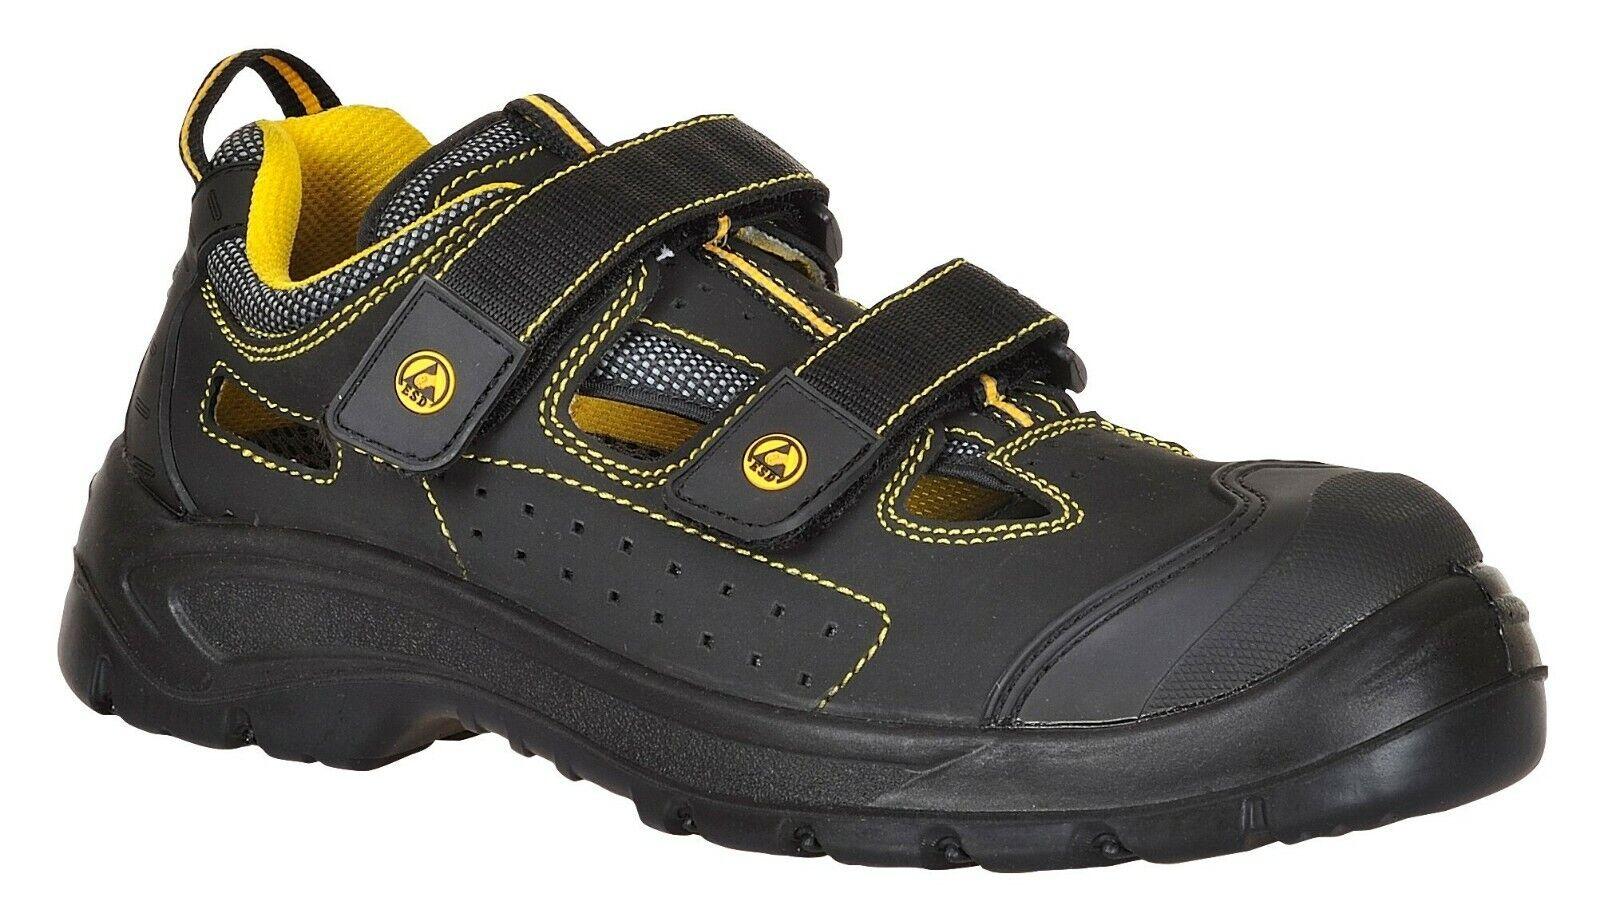 Portwest ESD Tagus Safety Sandal Trainer Shoes Non Metallic Toe Cap 3-13 FC04